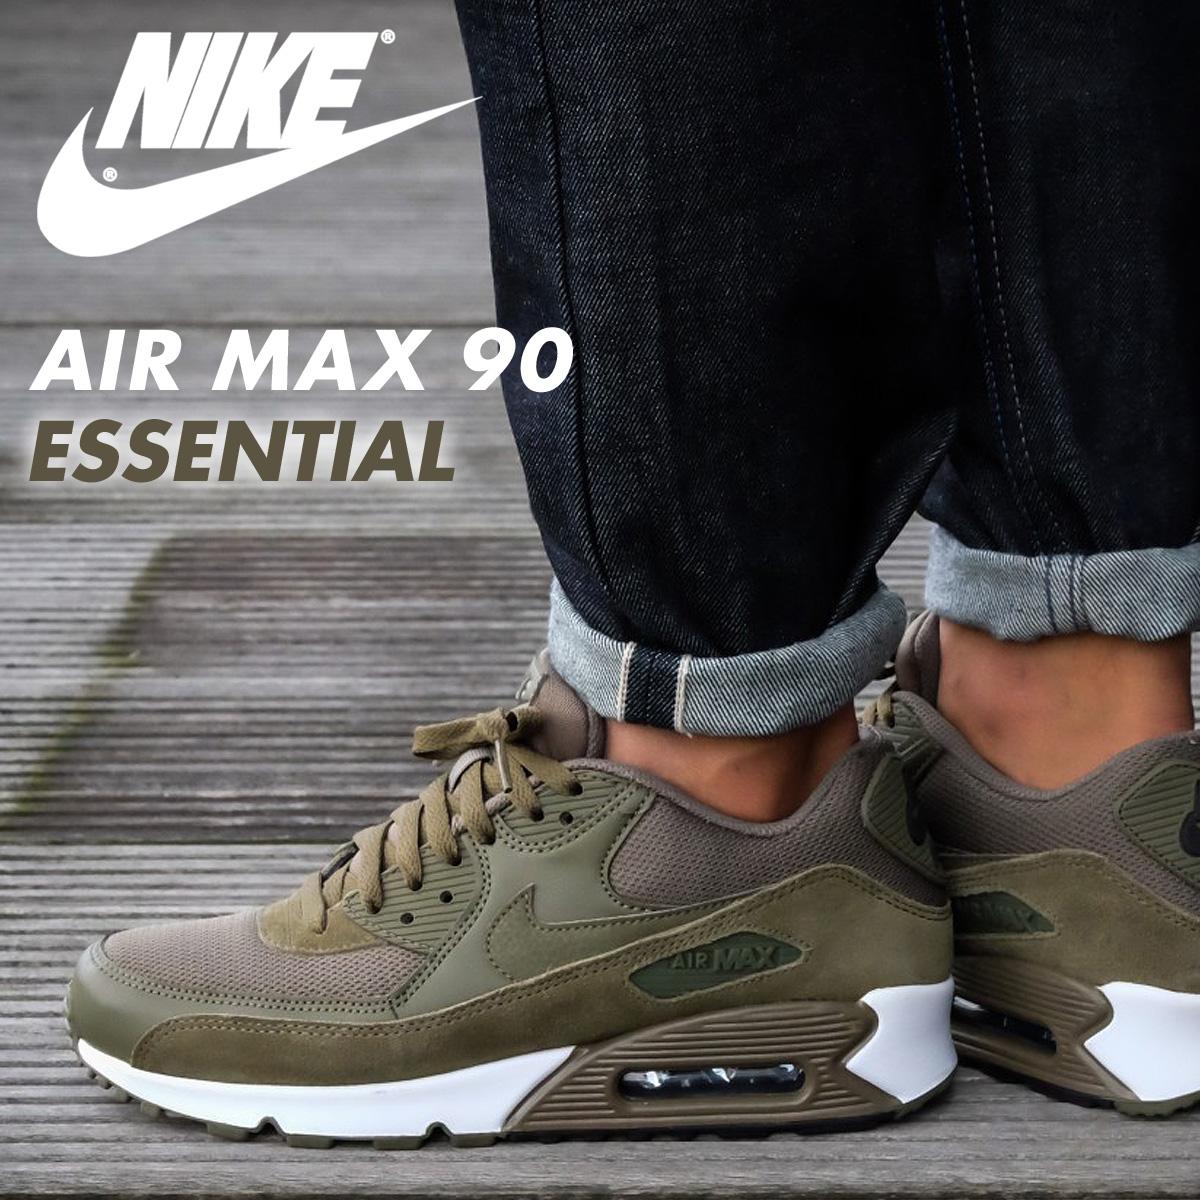 air max 90 olive